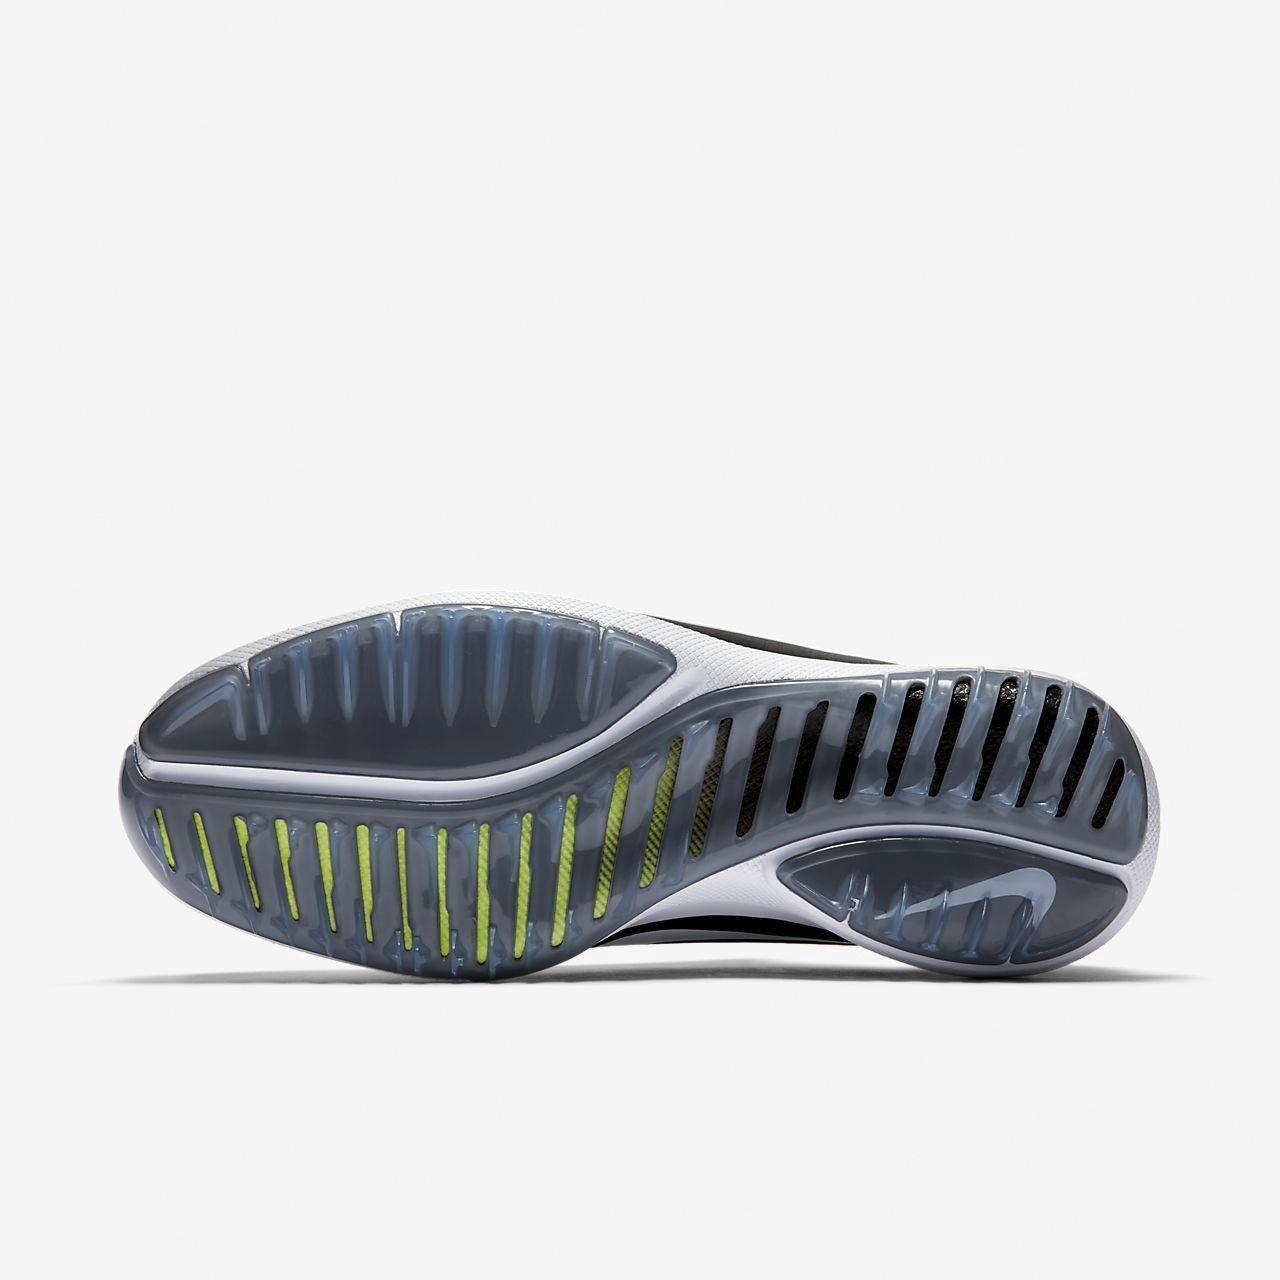 "the latest 837a9 6a493 Nike Lunar Control Vapor 2 Men's Golf Shoe - 10.5 #""mensgolfshoes ..."